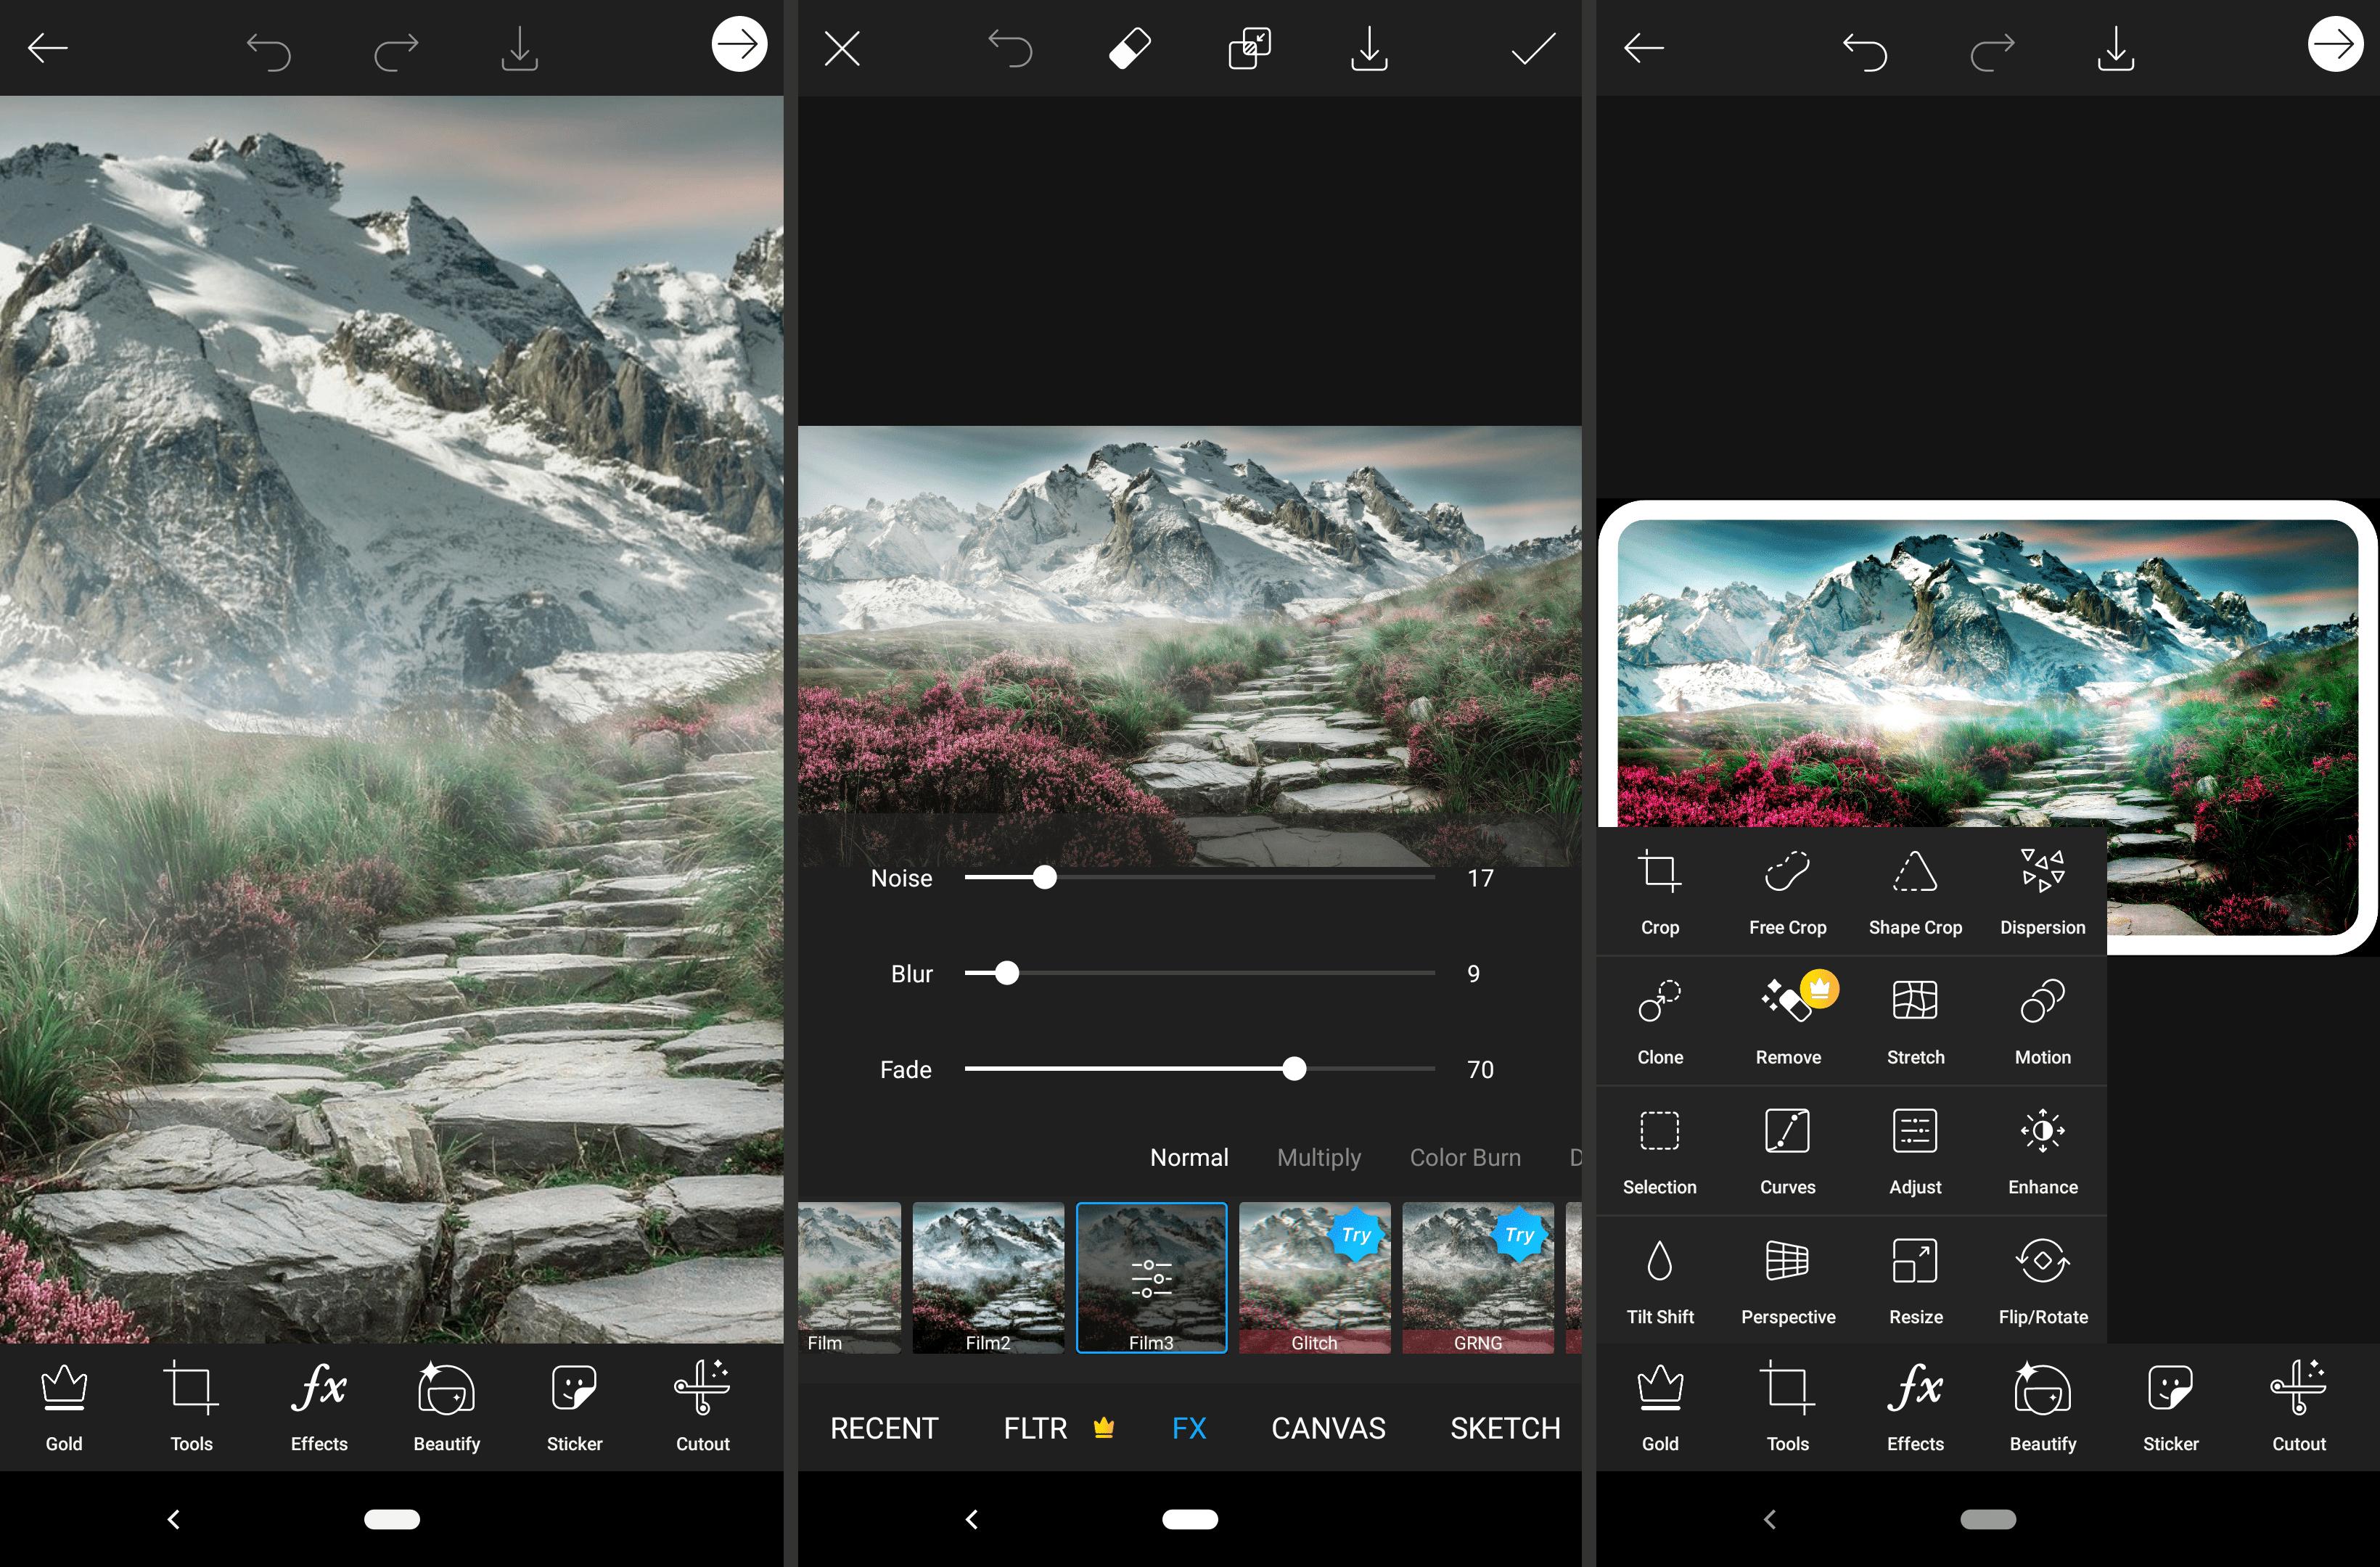 Screenshots of the Picsart Android image editor app